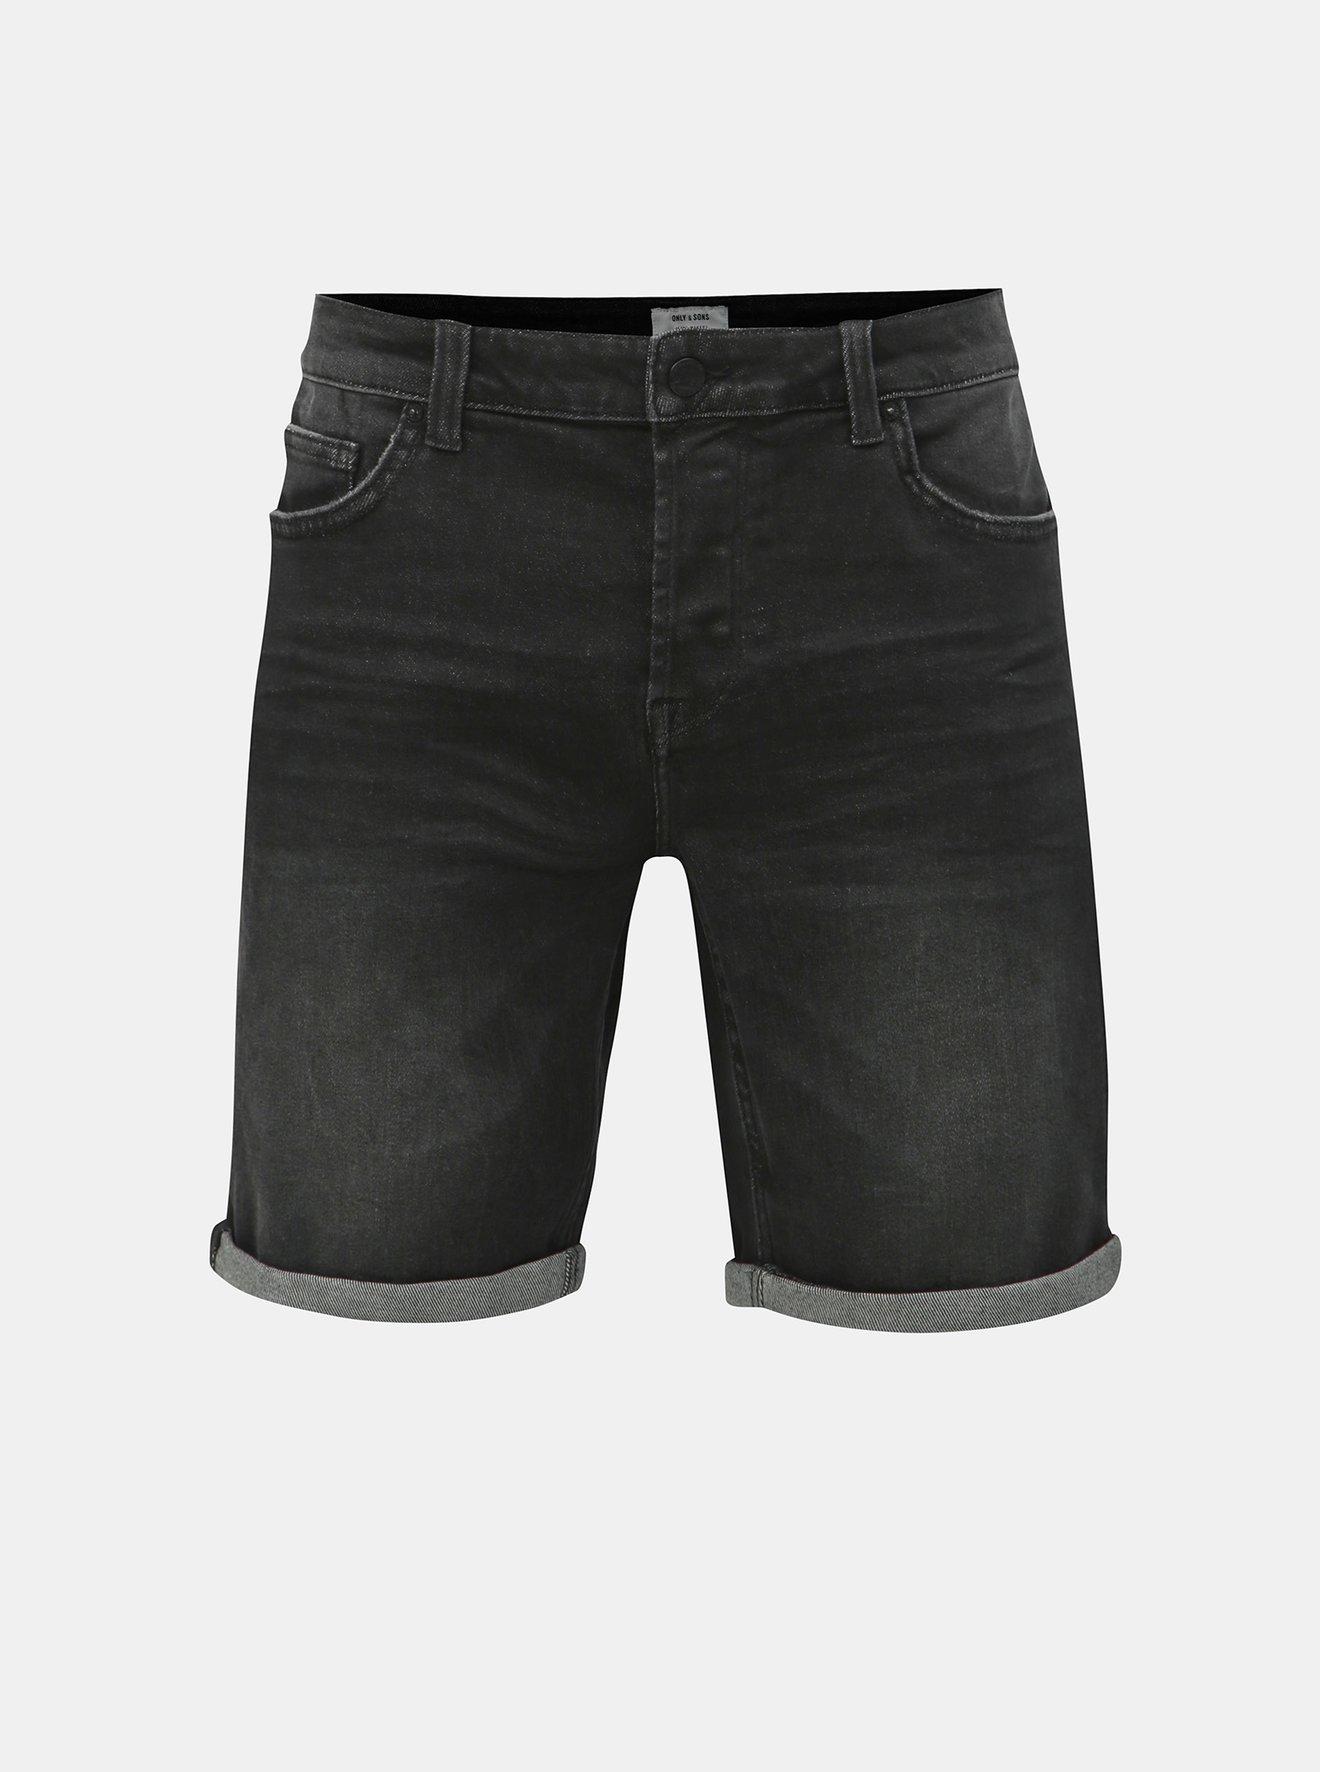 Černé džínové kraťasy ONLY & SONS Ply